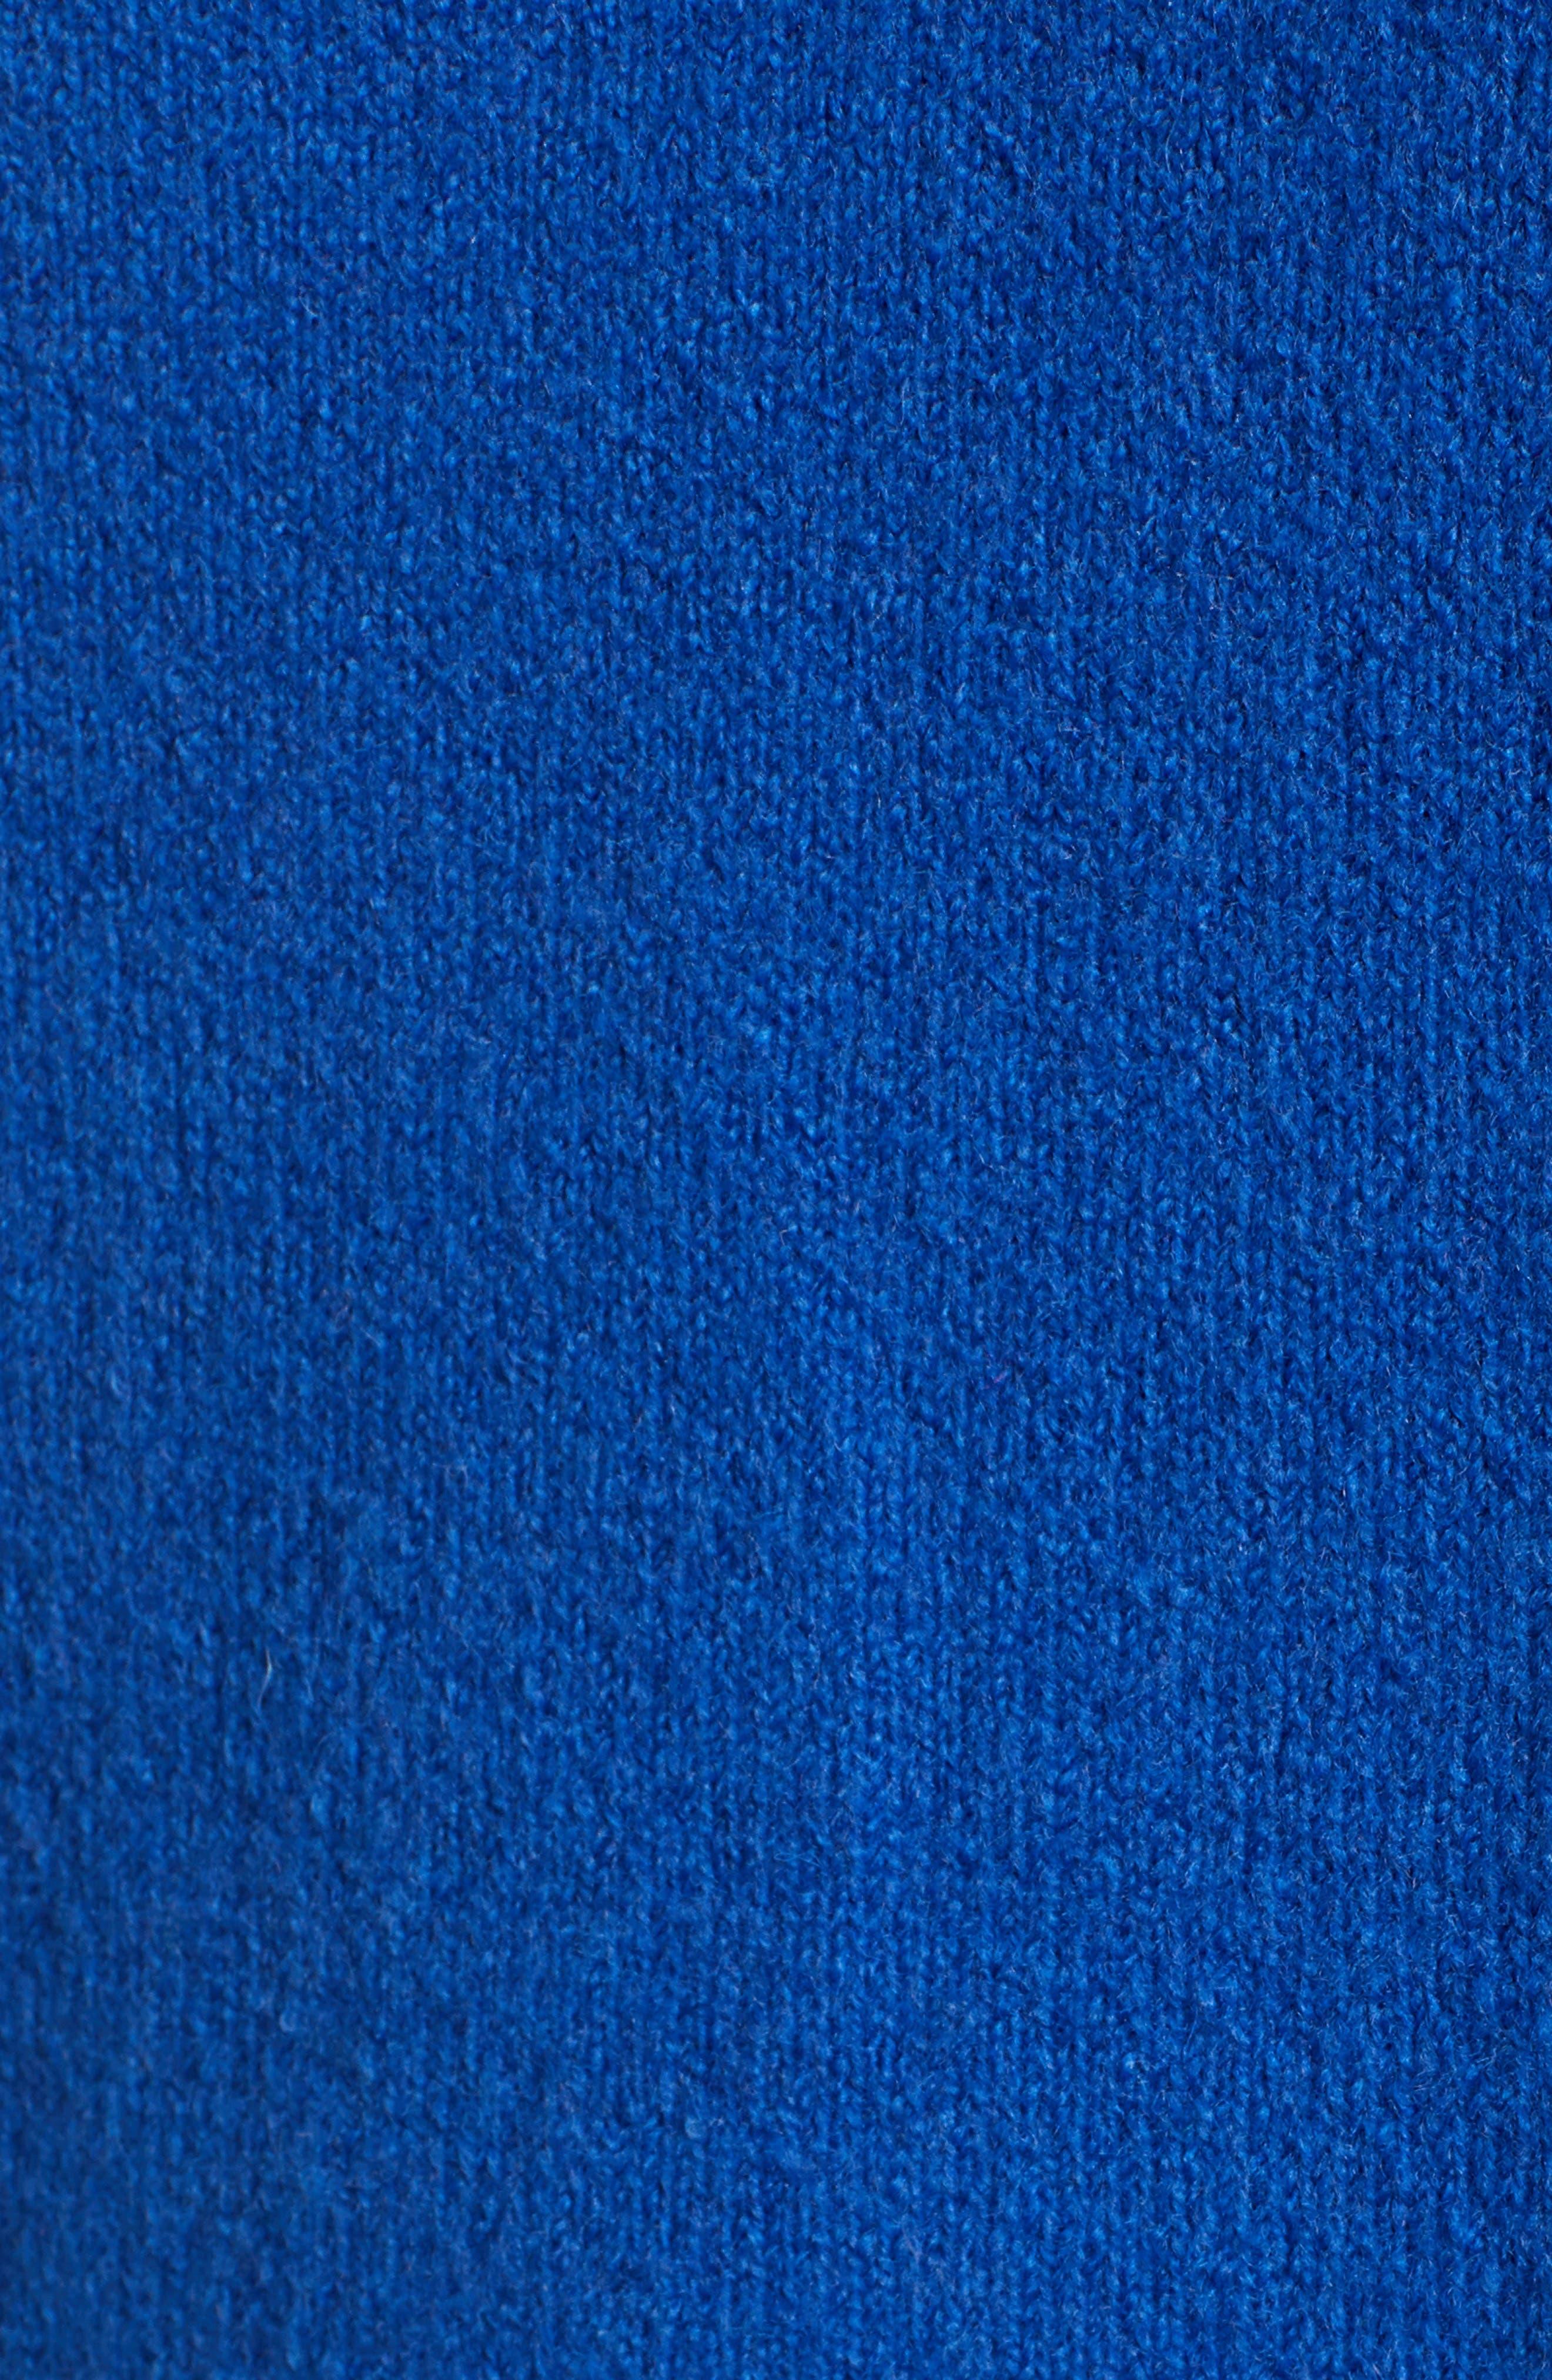 Turtleneck Wool Blend Tunic Sweater,                             Alternate thumbnail 5, color,                             BLUE MAZARINE